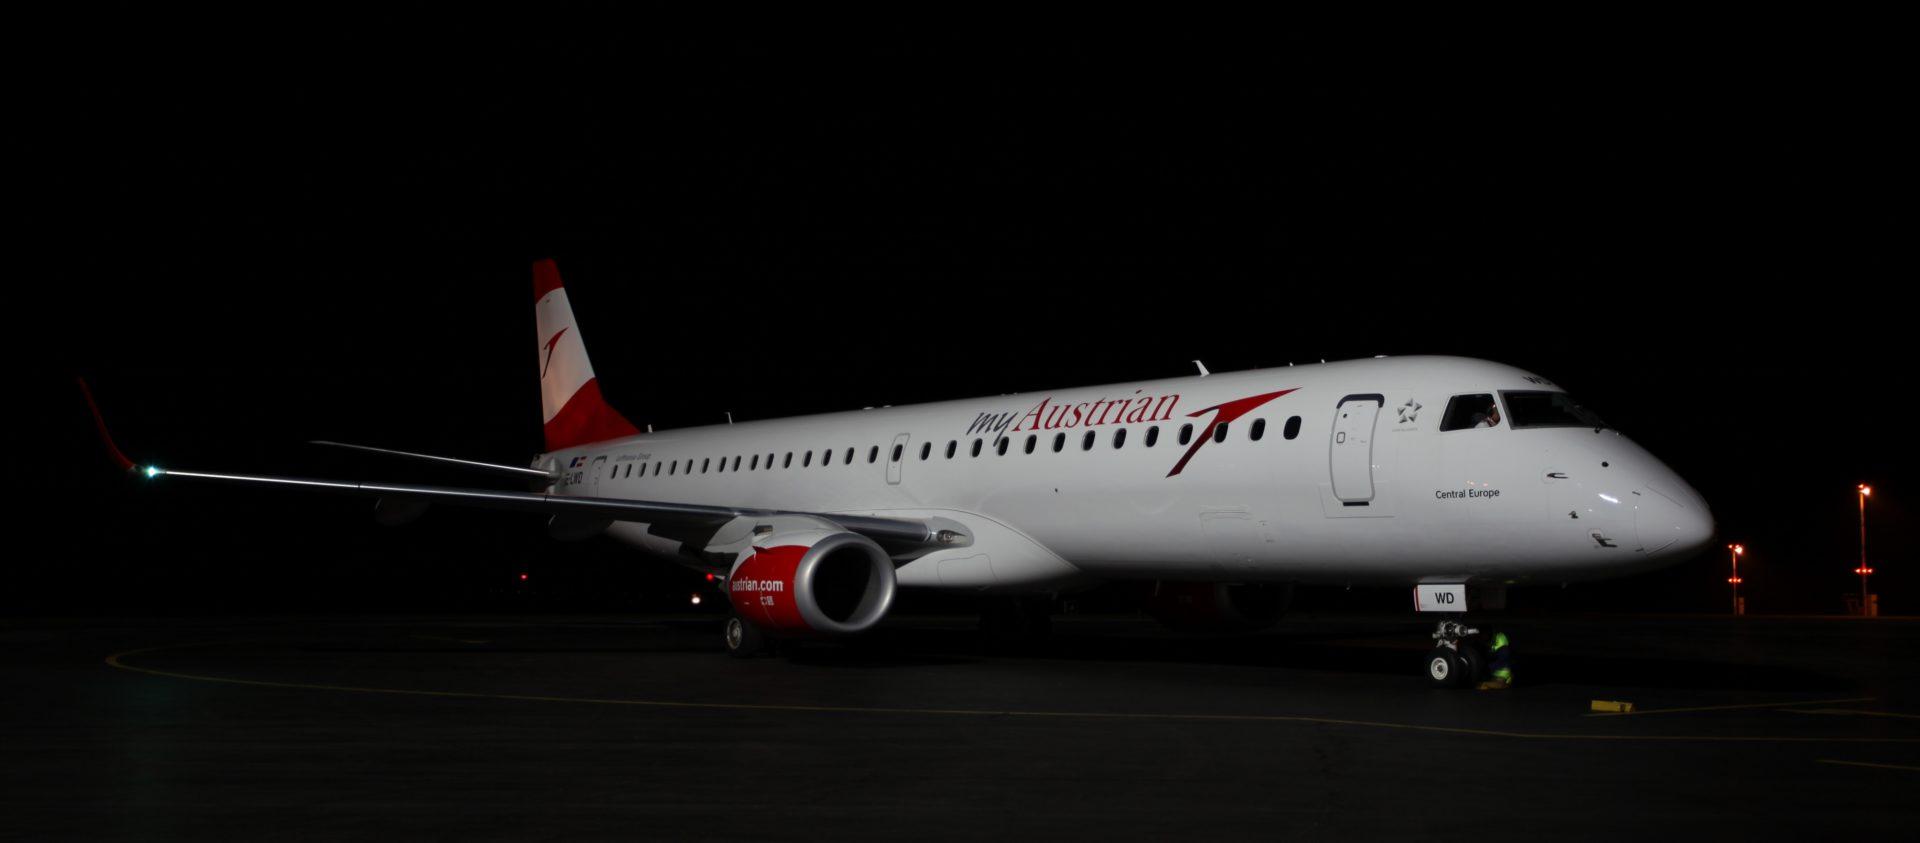 Embraer 195 spoločnosti Austrian Airlines. Foto: Manfréd Ťukot